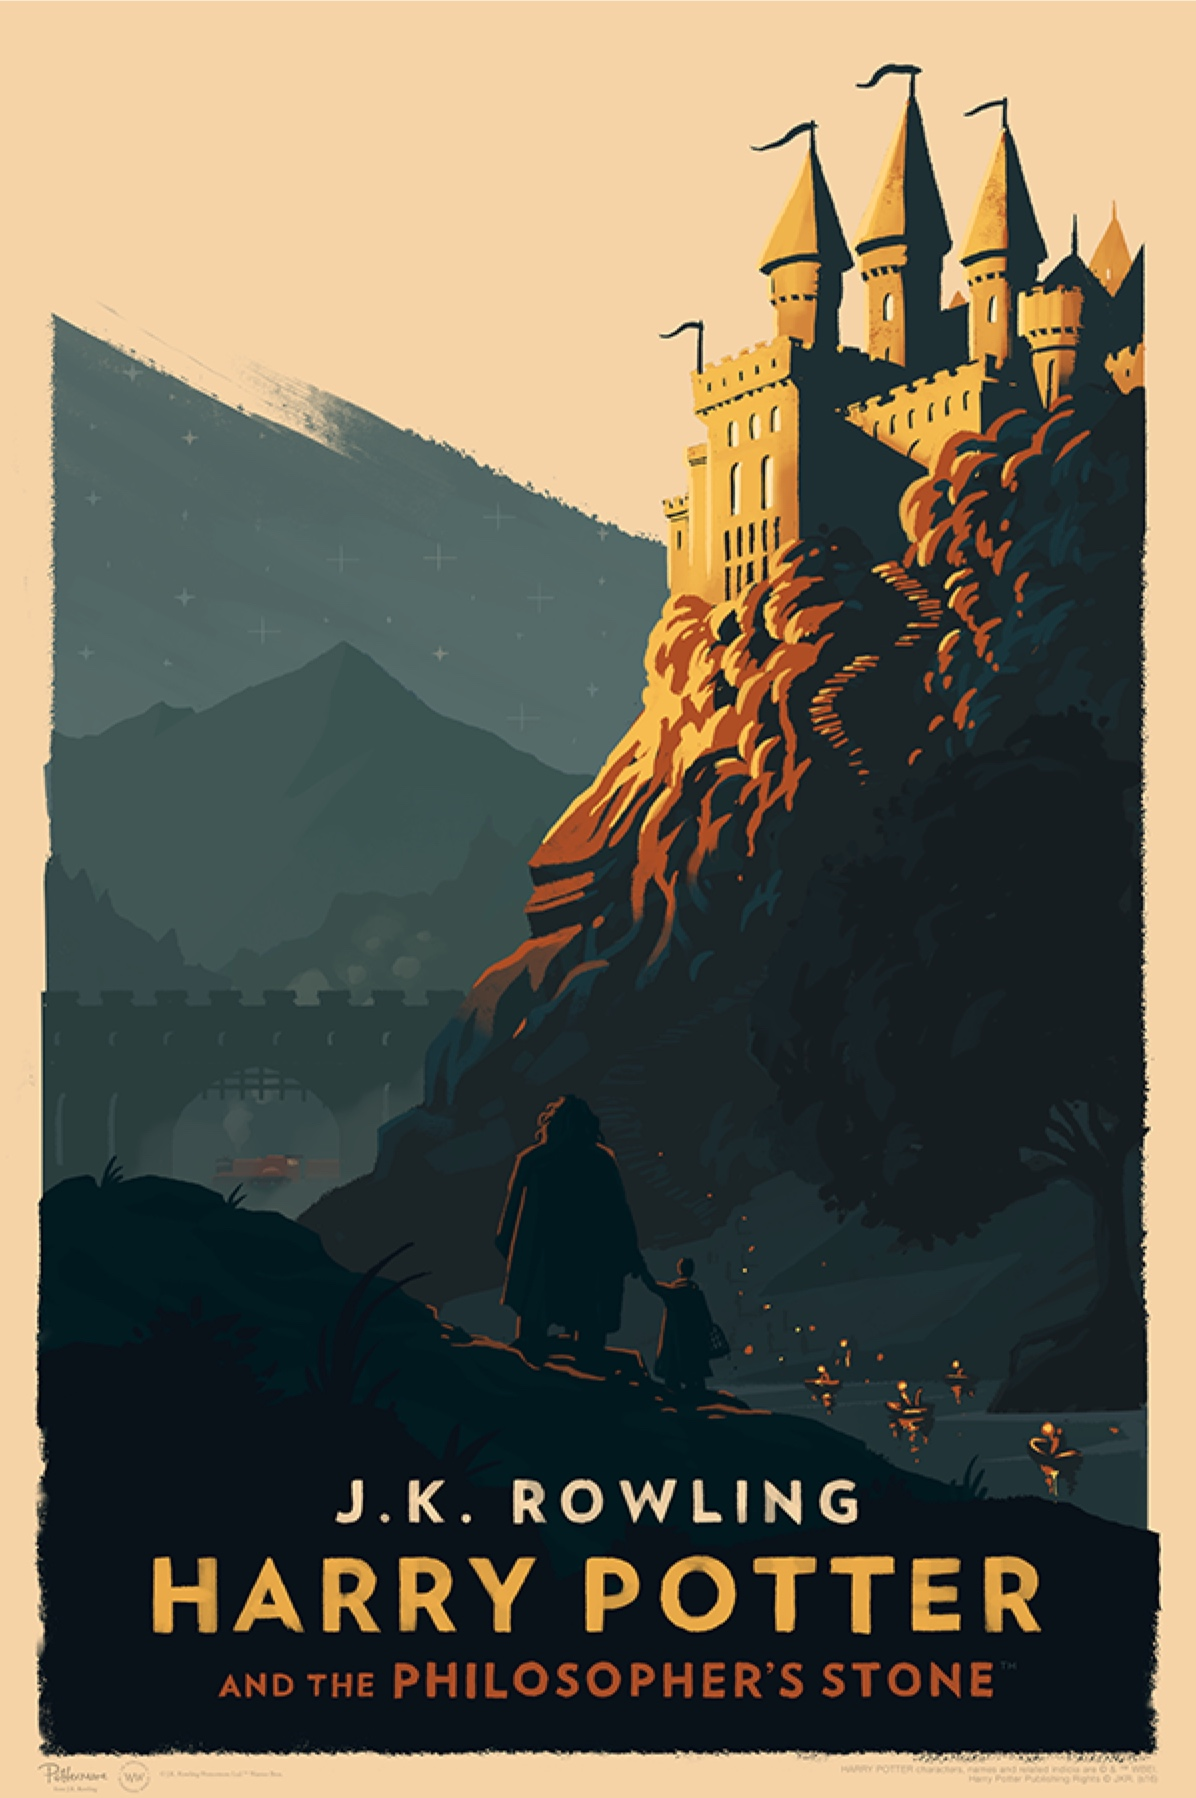 'Philosopher's Stone' Olly Moss Hogwarts poster